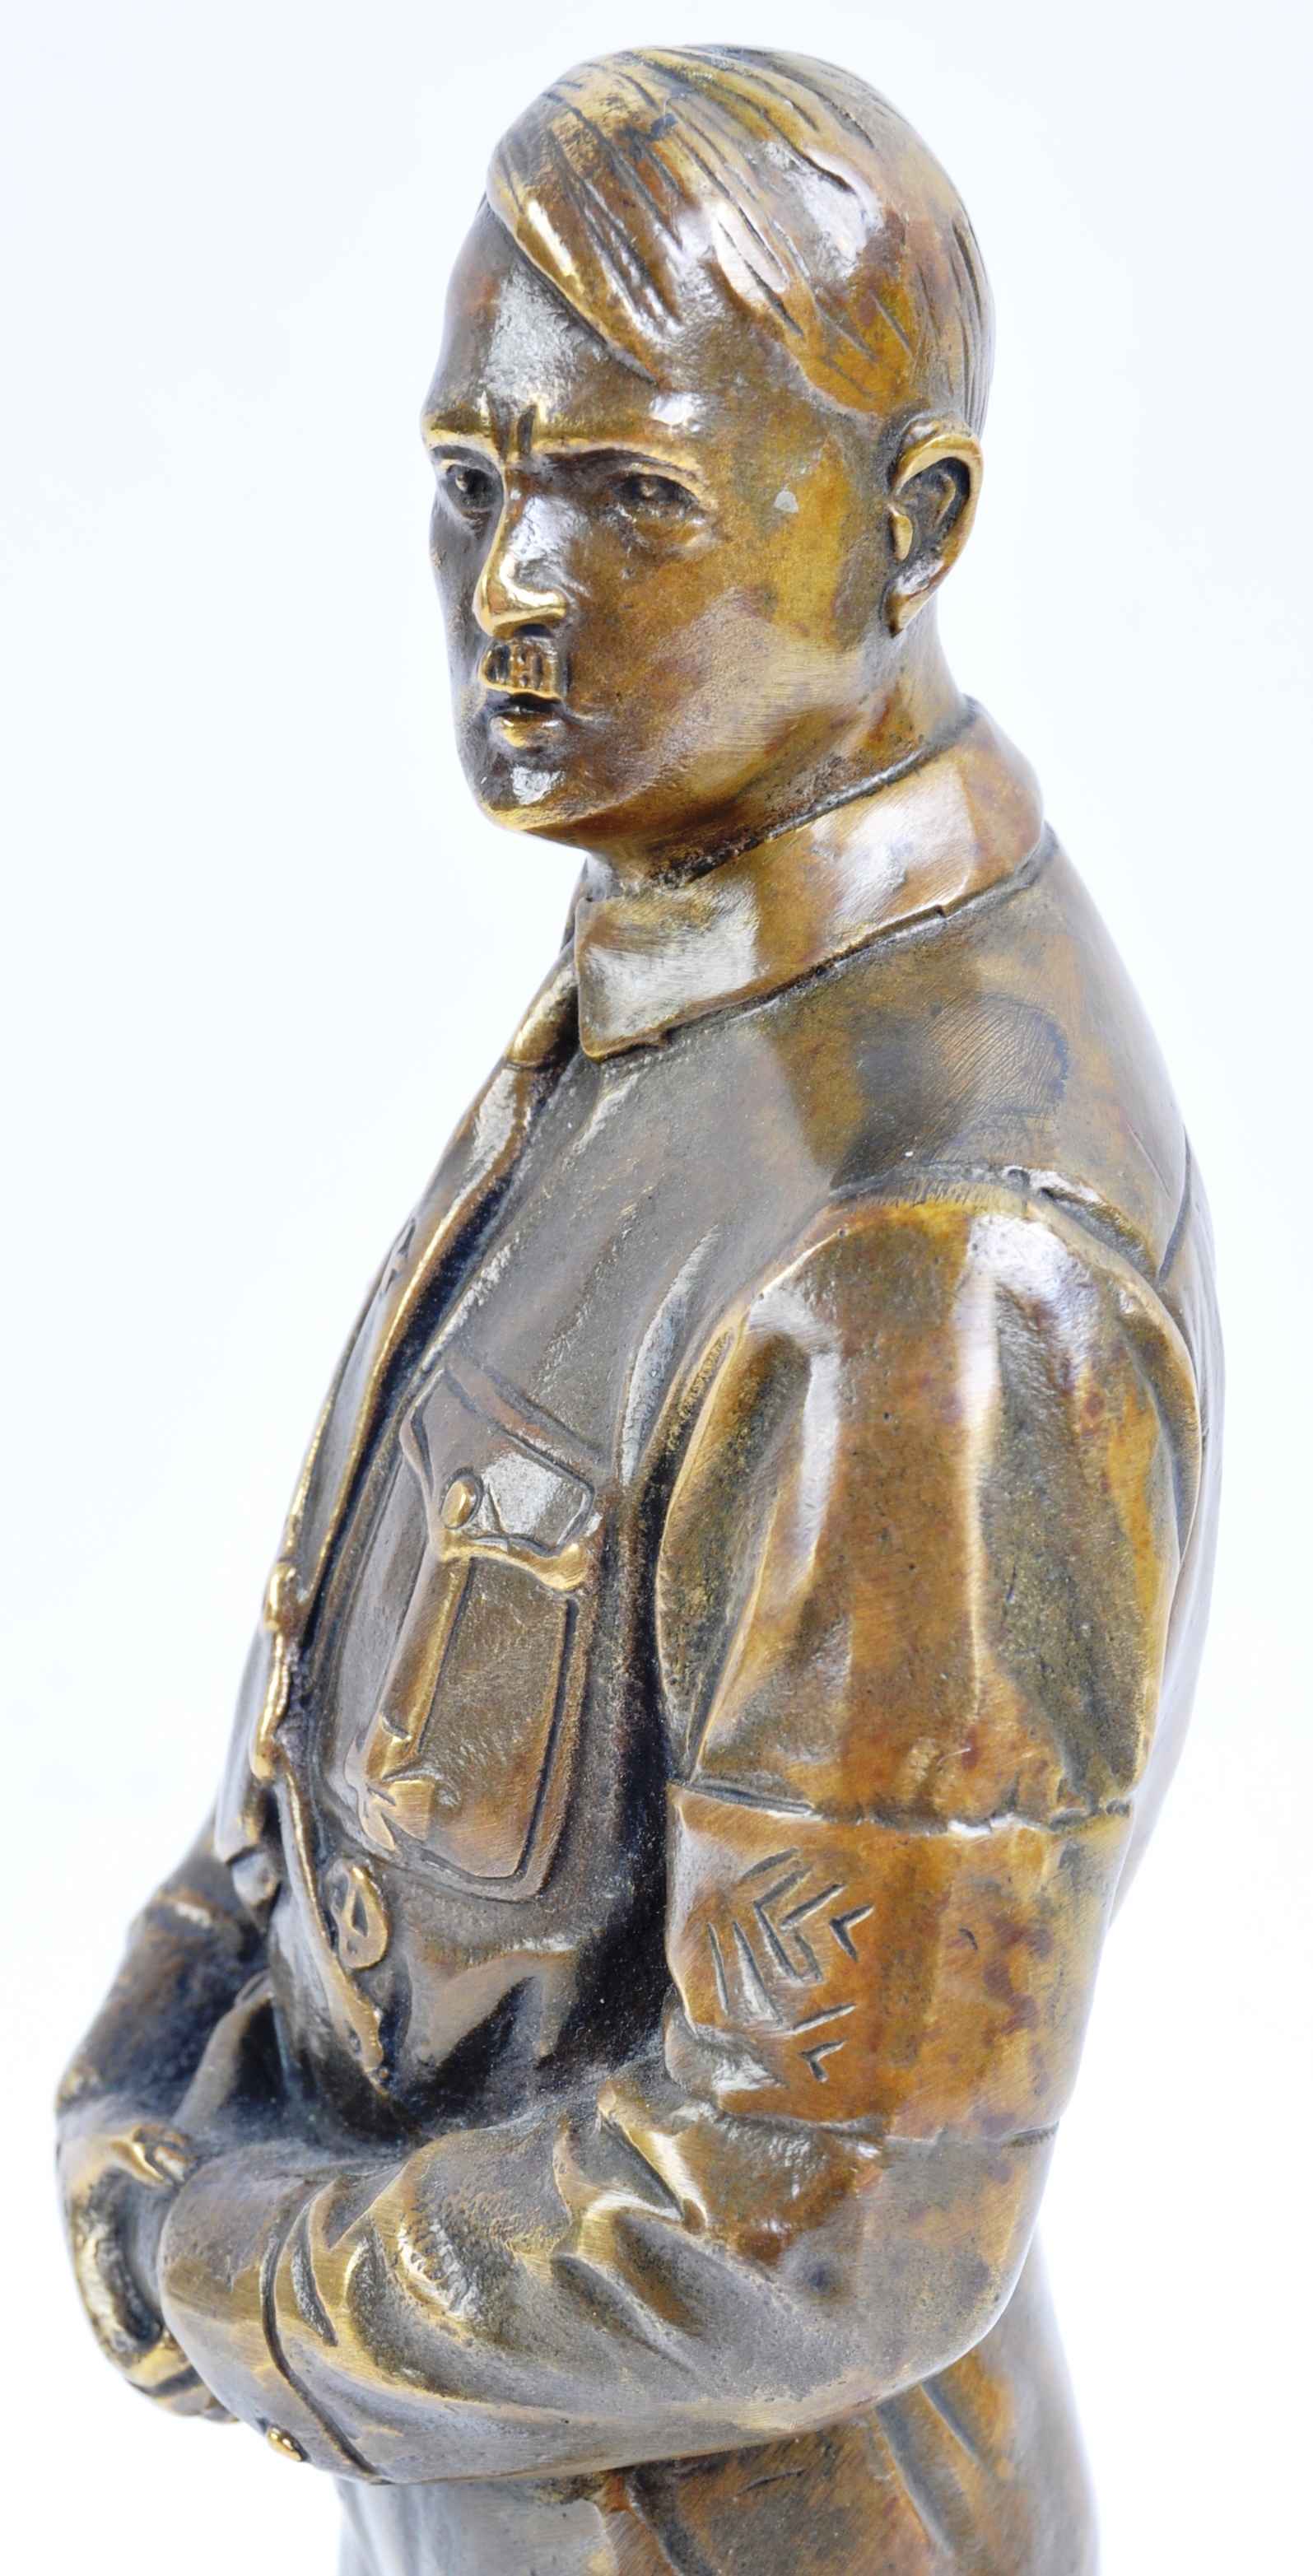 WWII SECOND WORLD WAR INTEREST - BRONZE STATUE OF ADOLF HITLER - Image 5 of 6